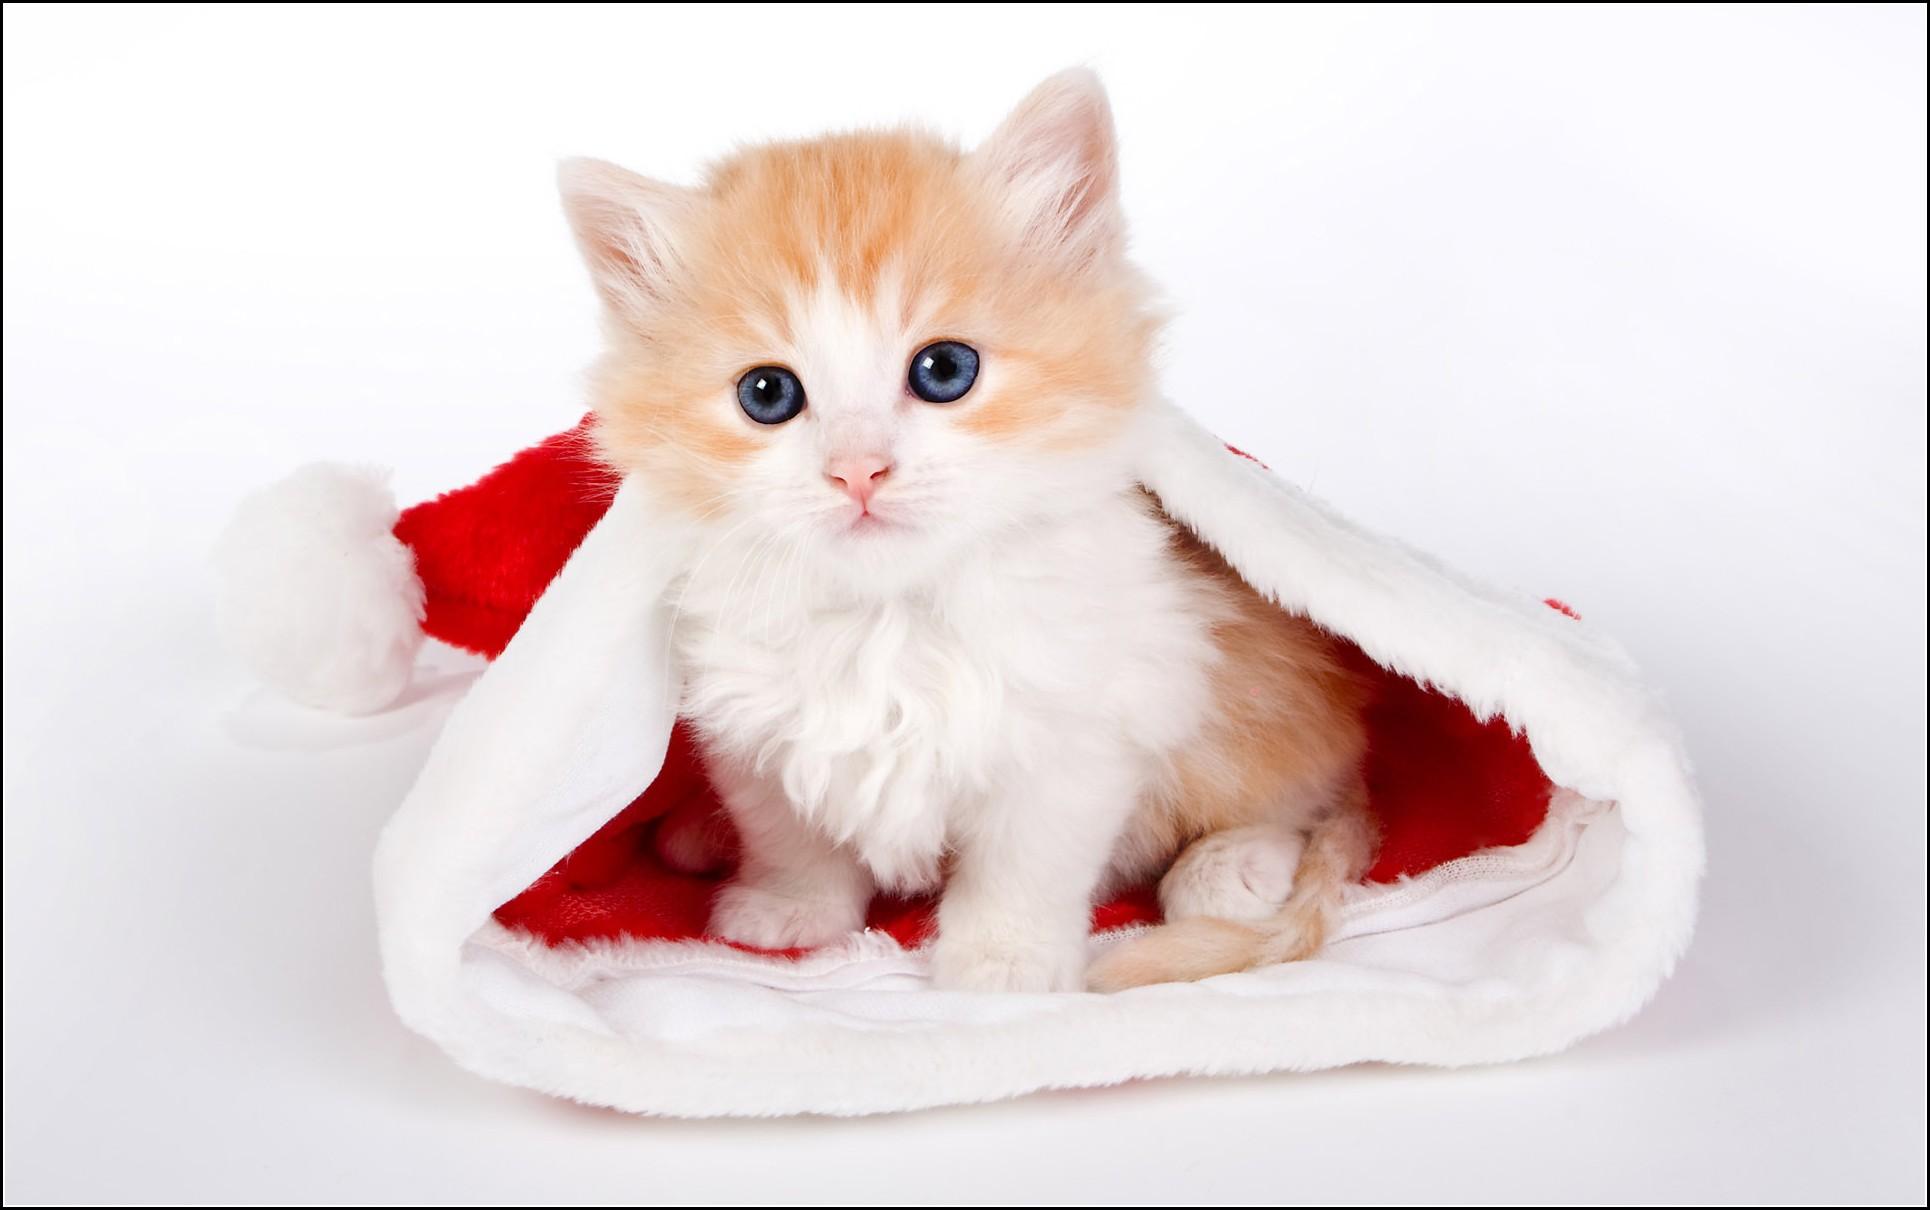 Cute Kitten Pictures Tumblr